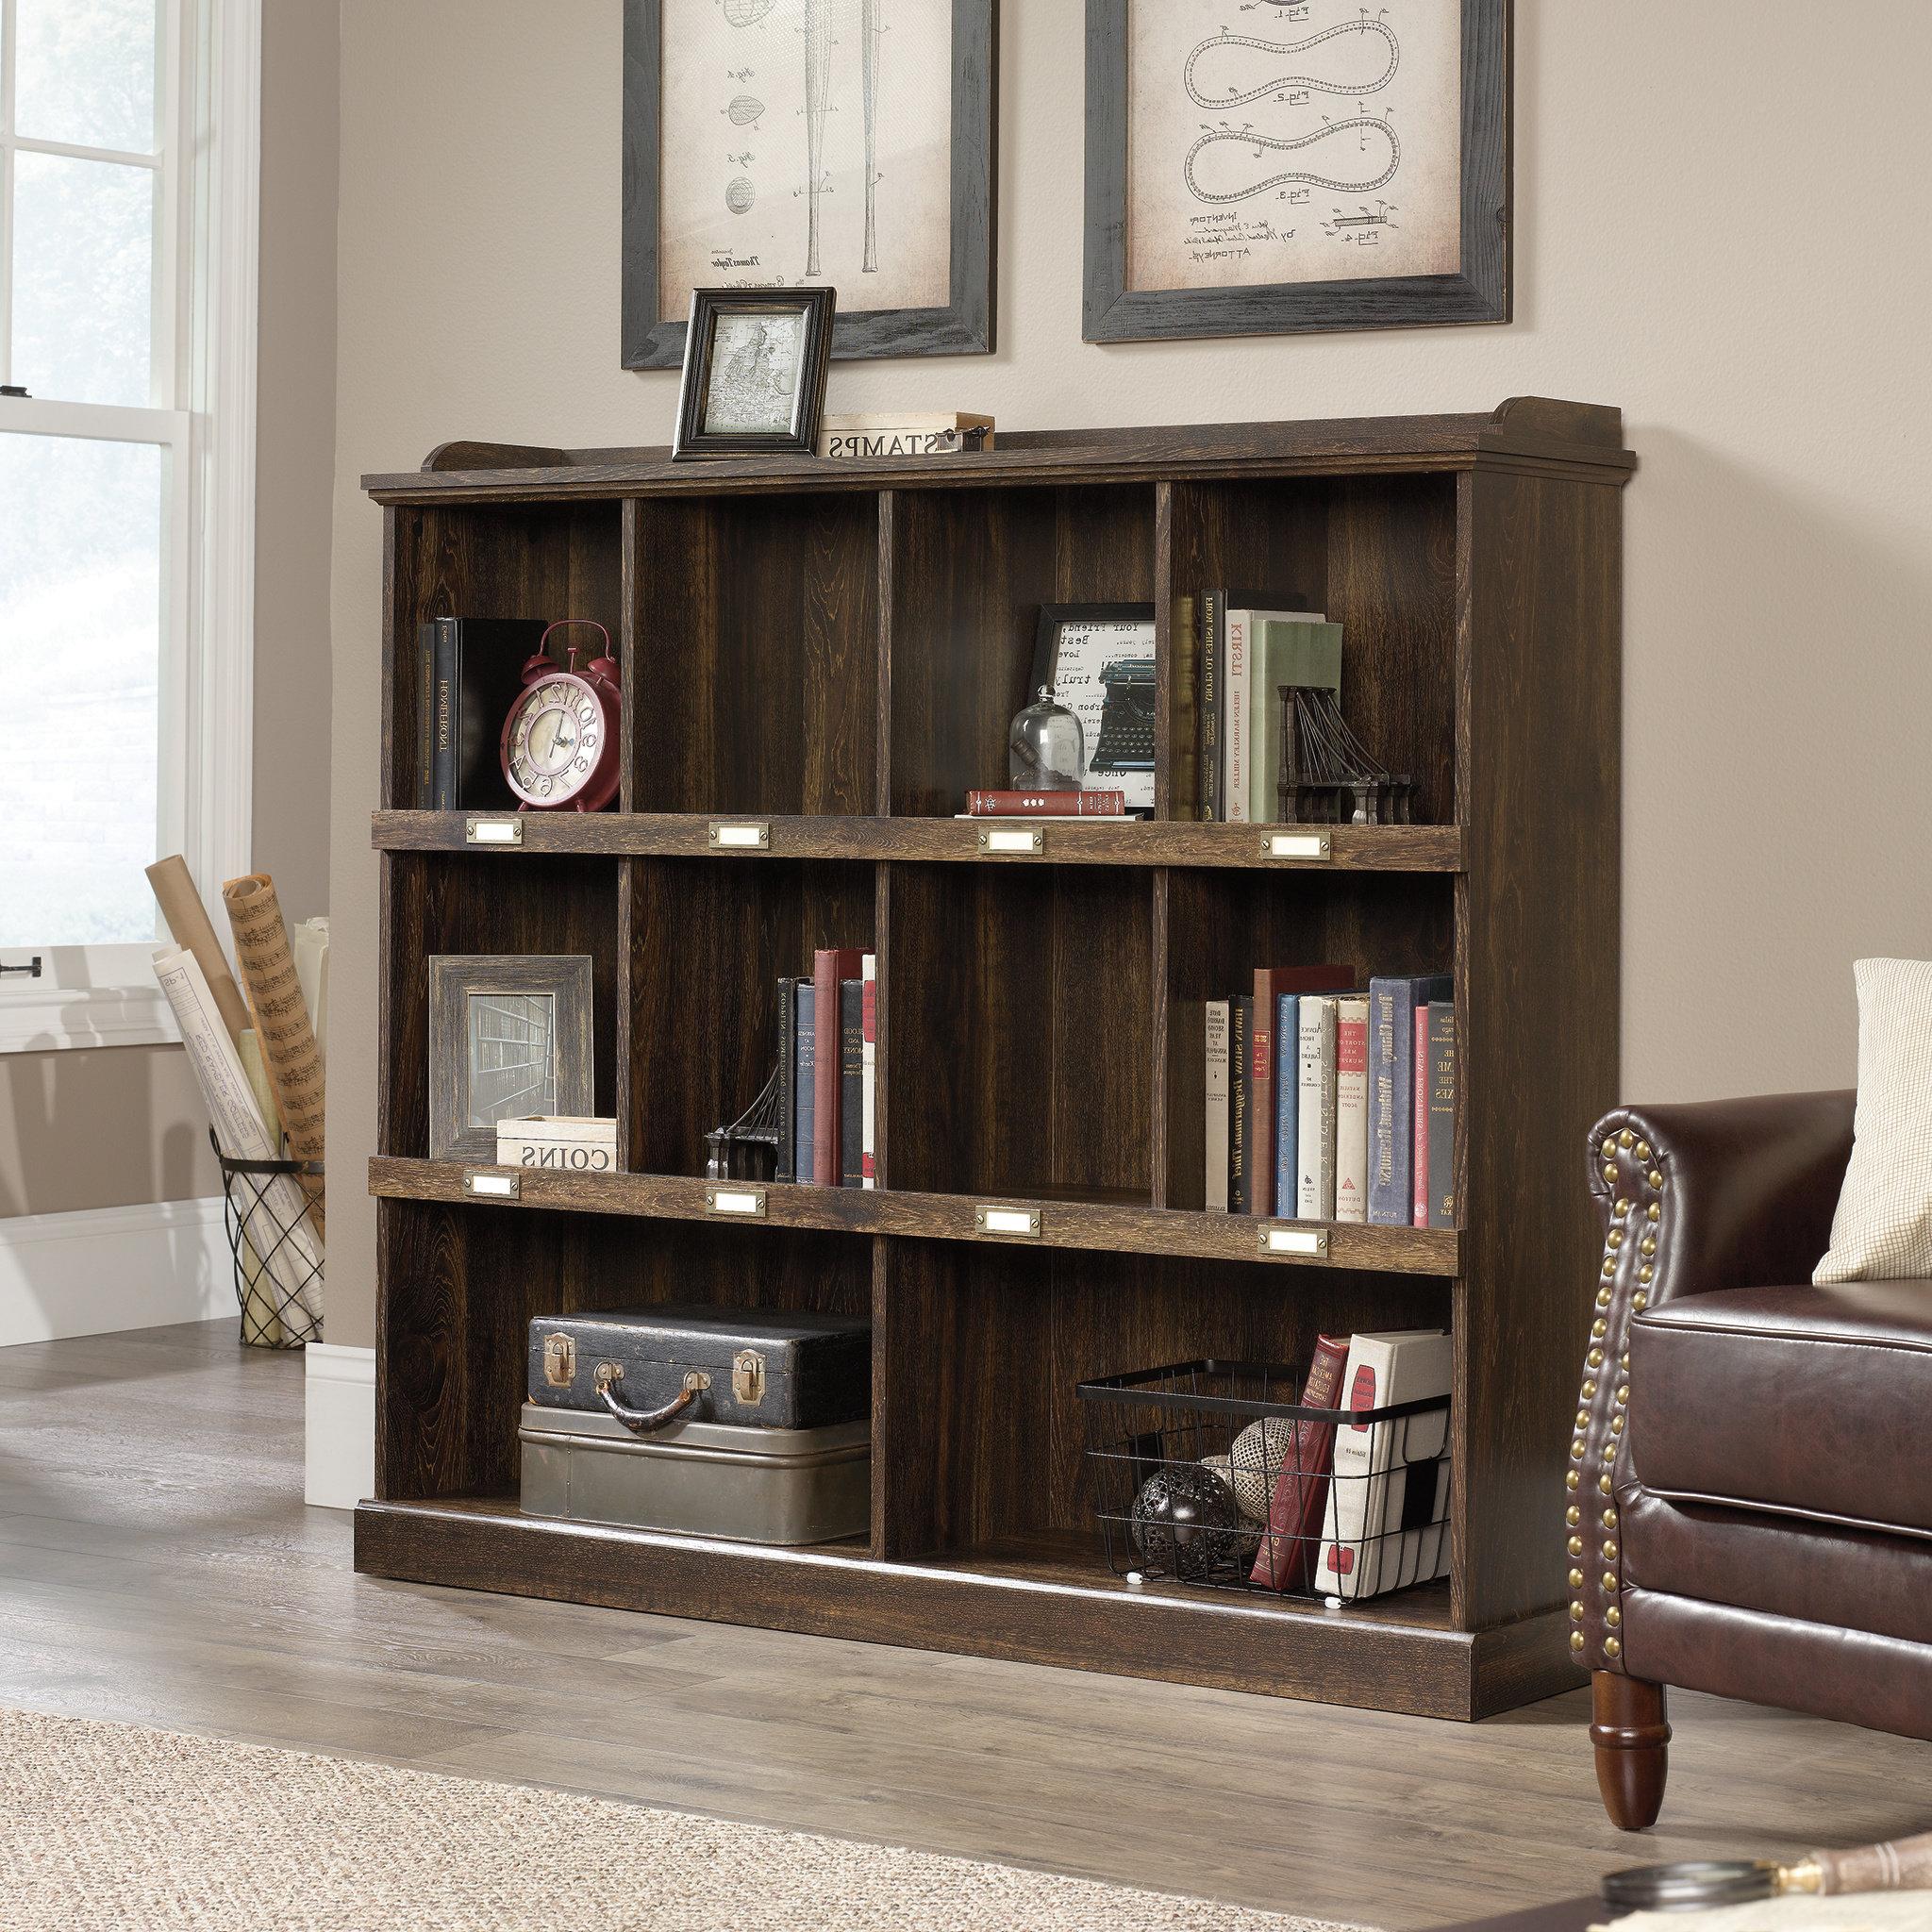 Trendy Bowerbank Standard Bookcase Throughout Bowerbank Standard Bookcases (View 19 of 20)